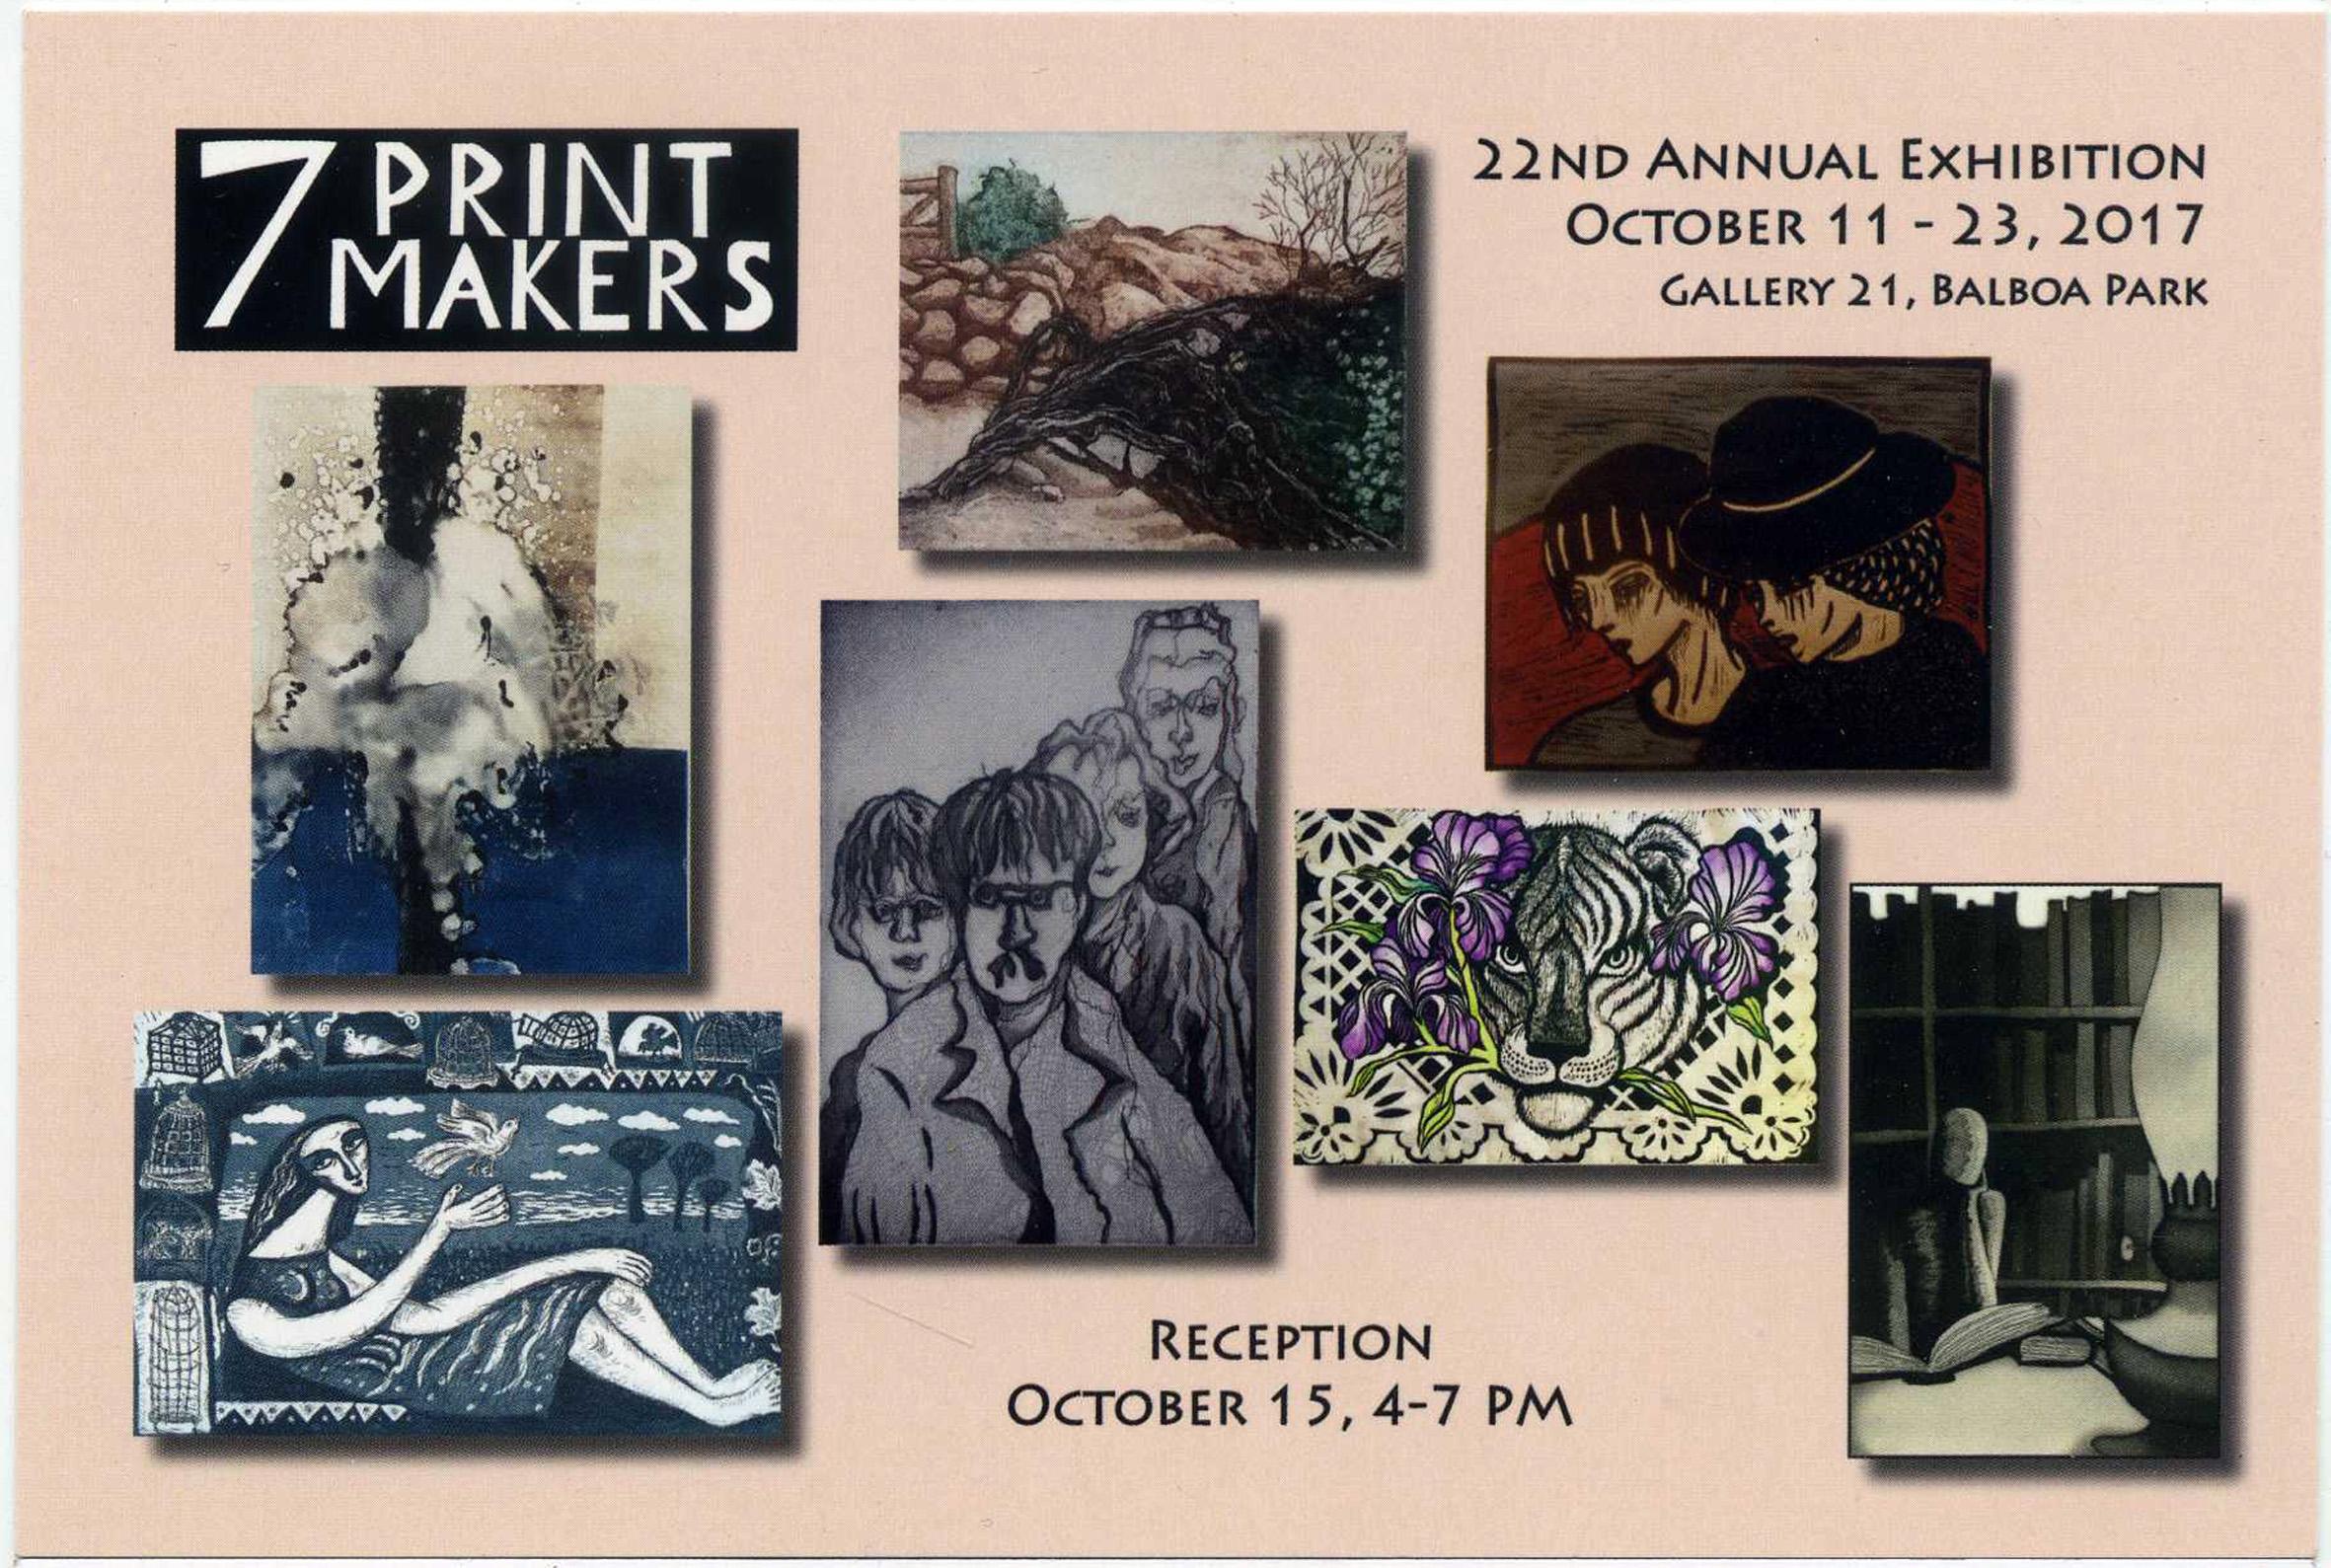 2017 7 Printmakers invitation